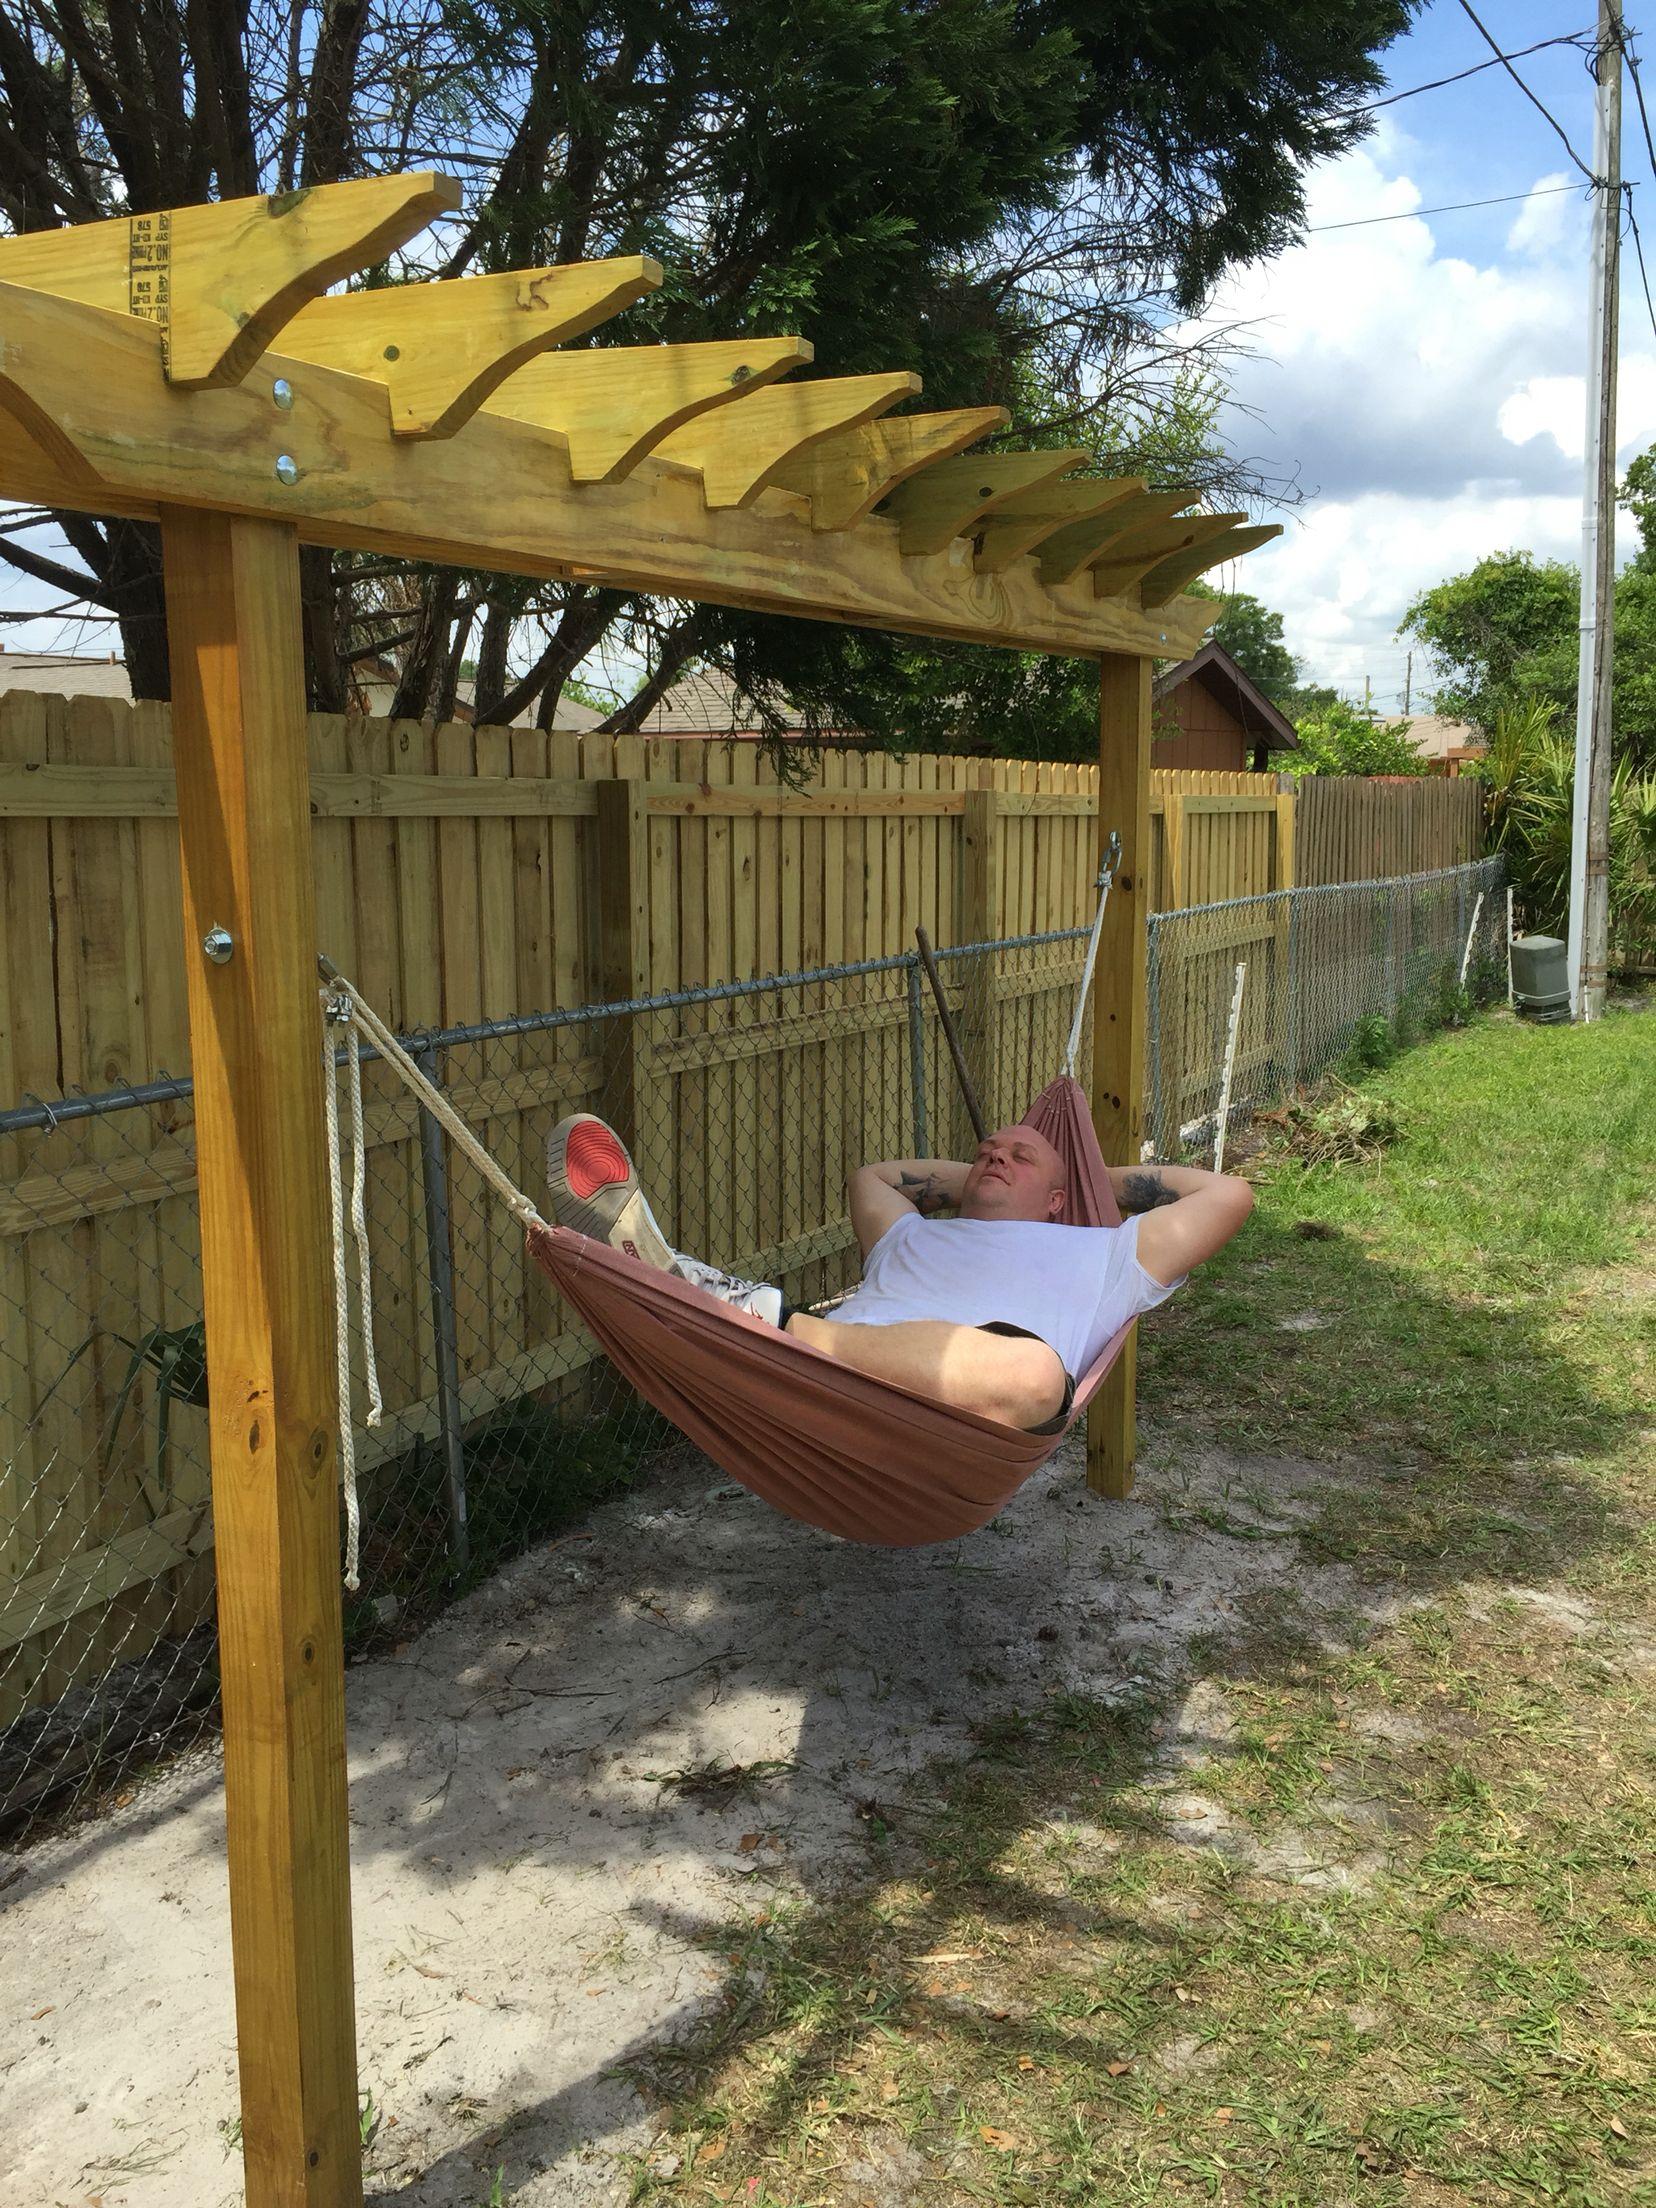 Back yard hammock swing pergola done for under Ute